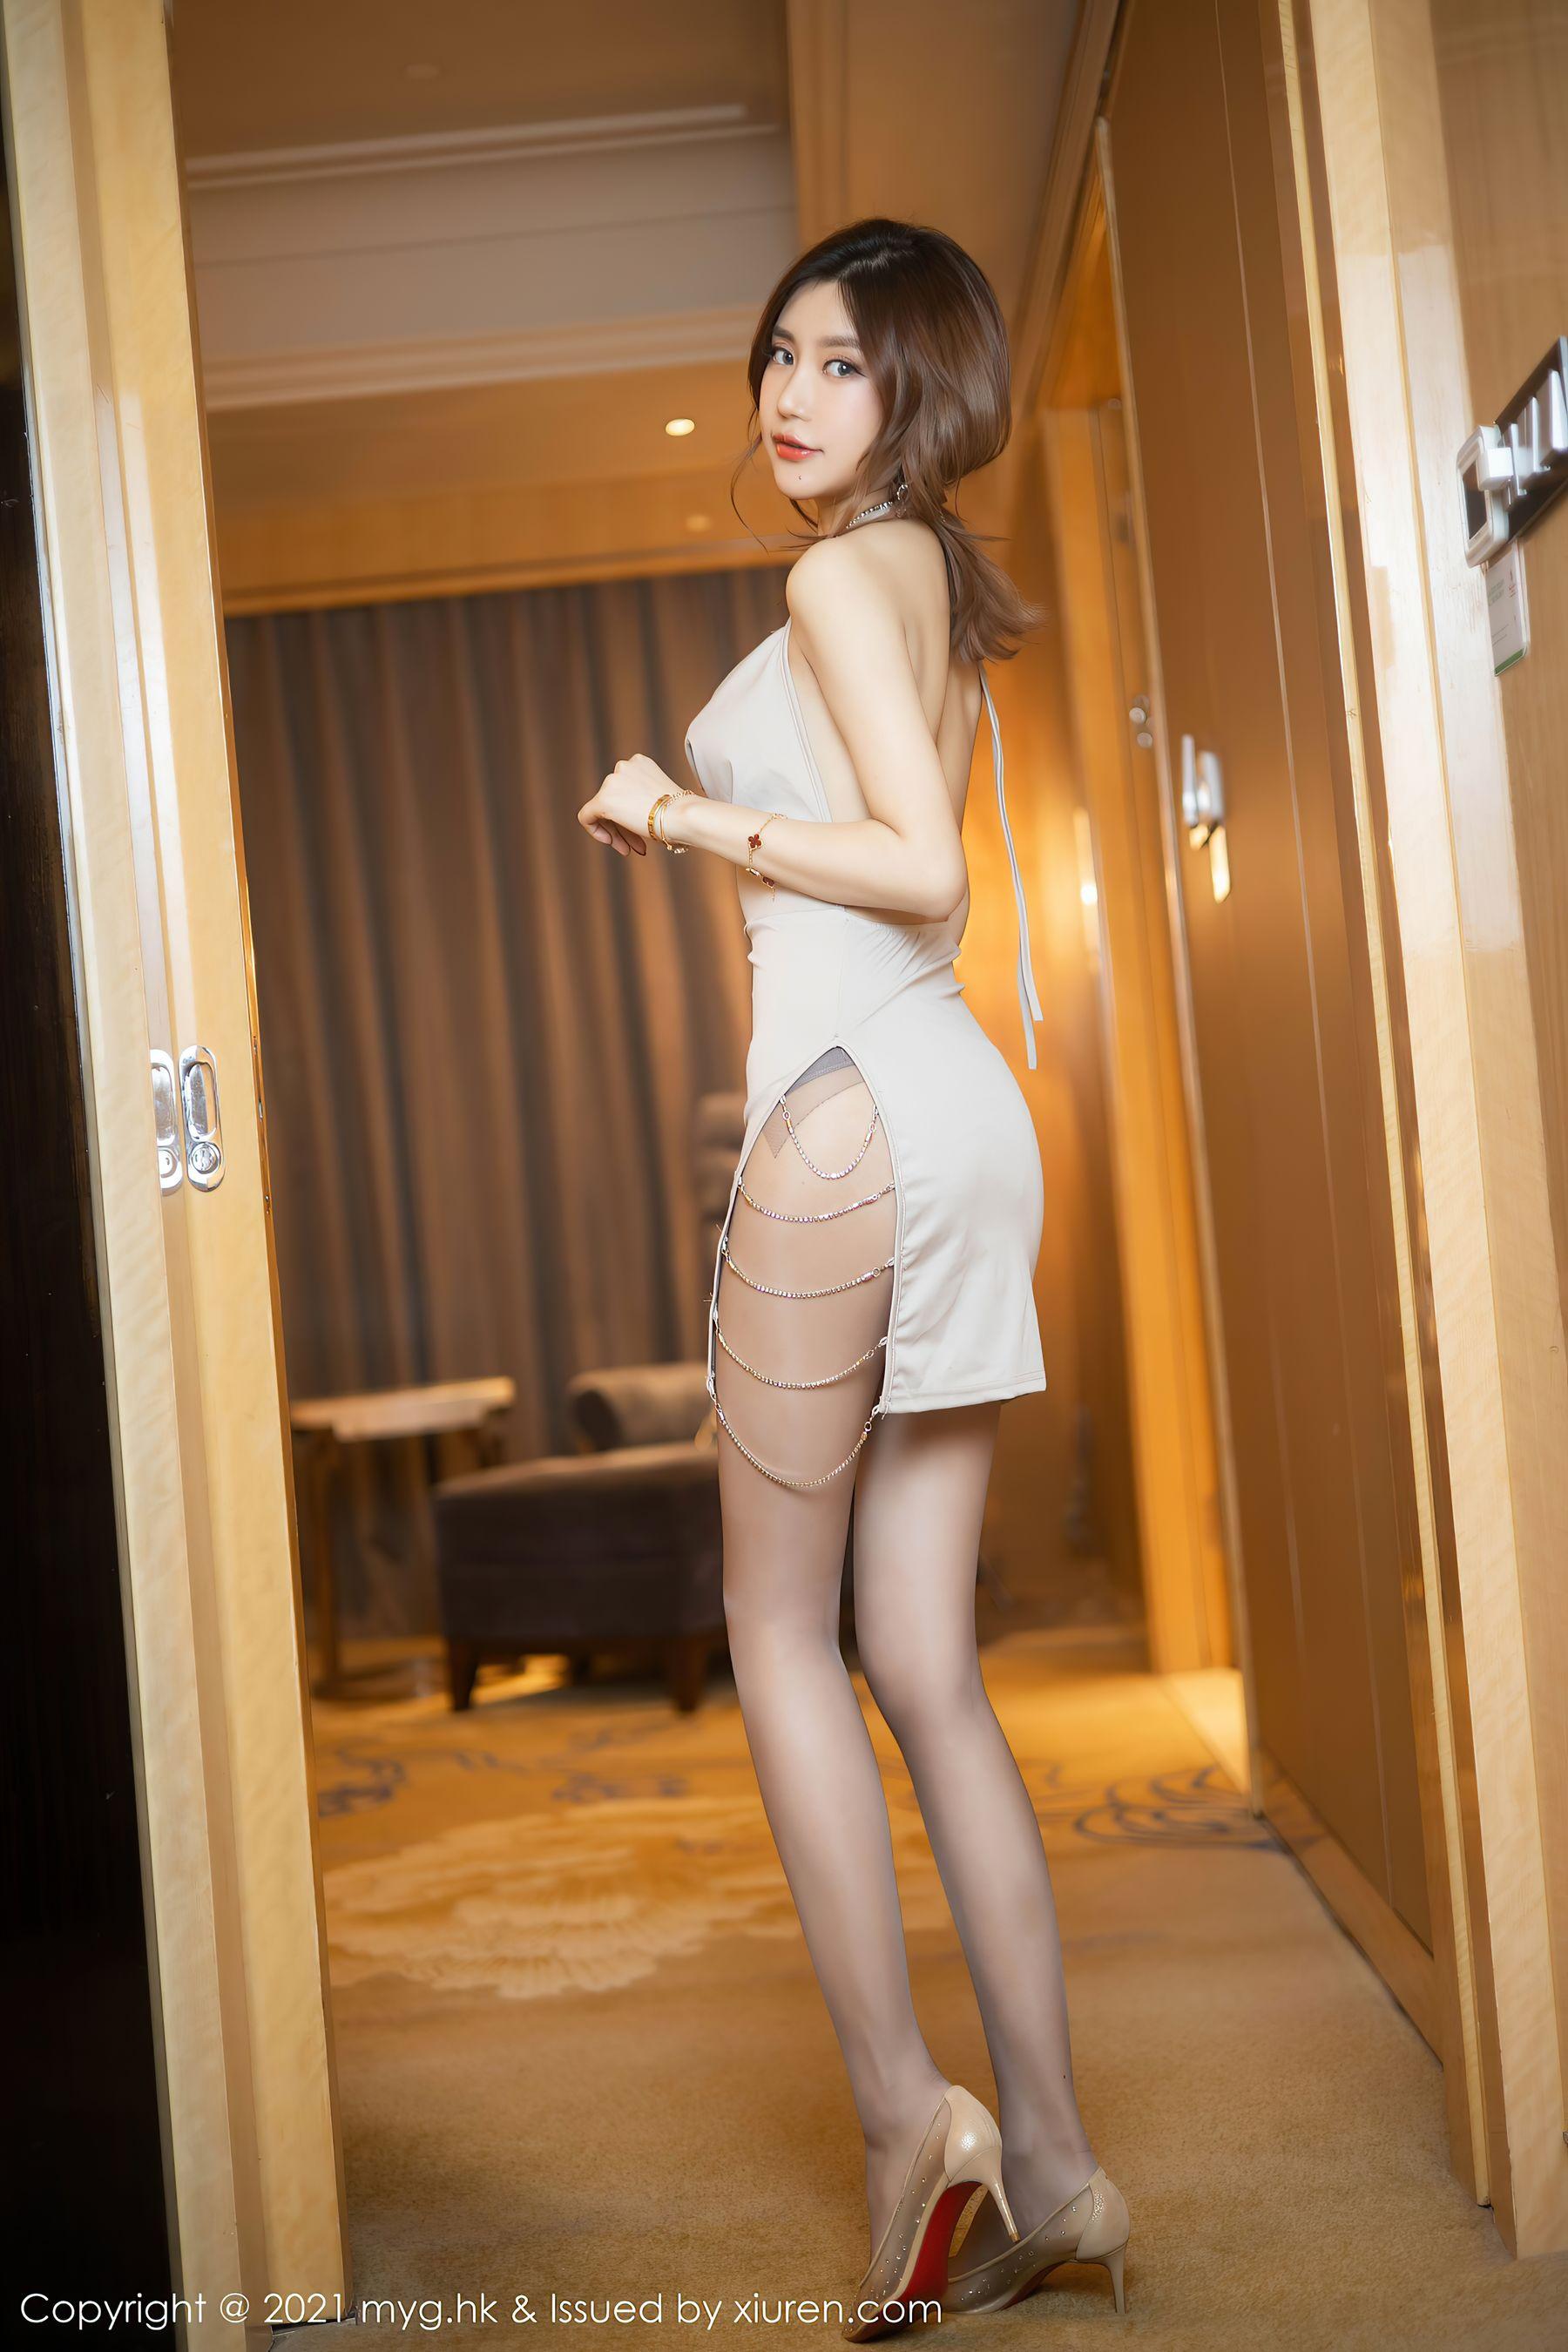 VOL.1660 [美媛馆]丝袜女郎吊带:Carina梦绮(绮里嘉Ula)超高清写真套图(60P)